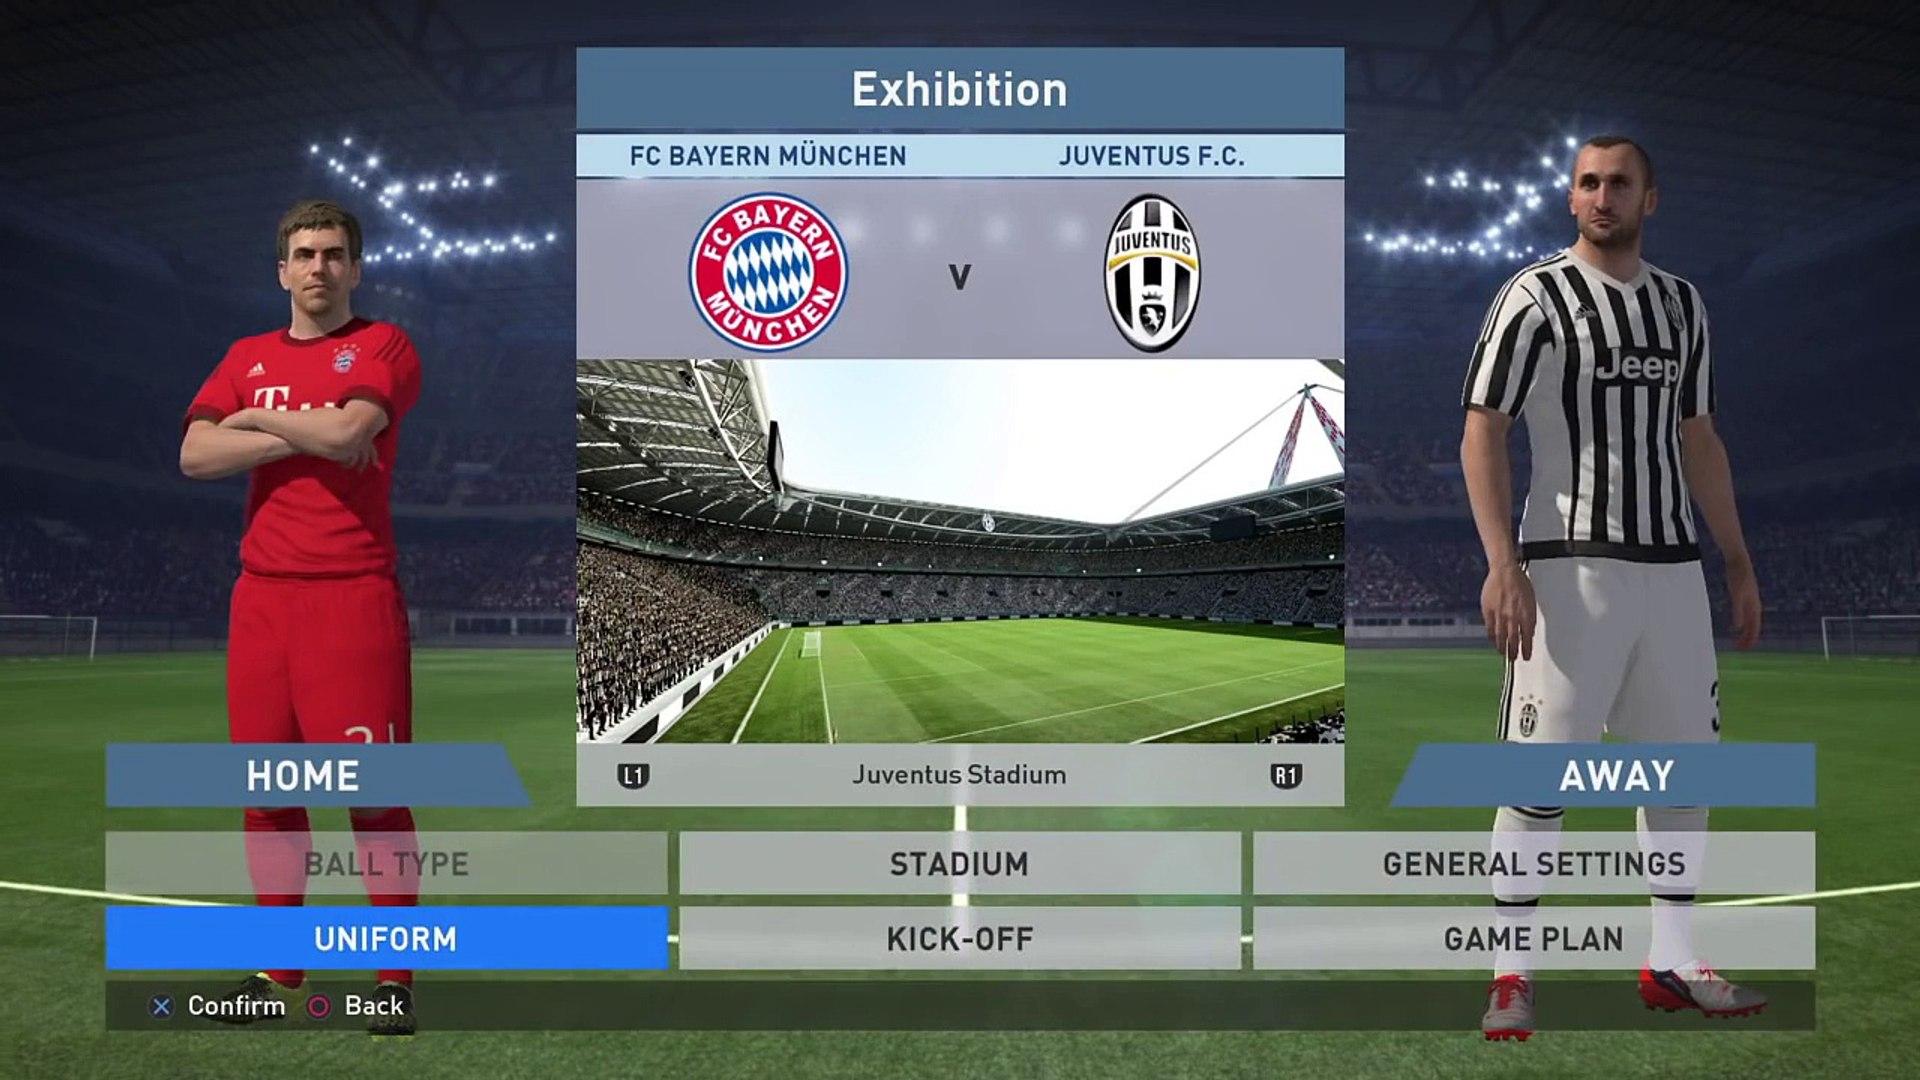 PES 2016 Gameplay FC BAYERN VS JUVENTUS Demo Pro Evolution 2016 Demo Gameplay | Xbox One/